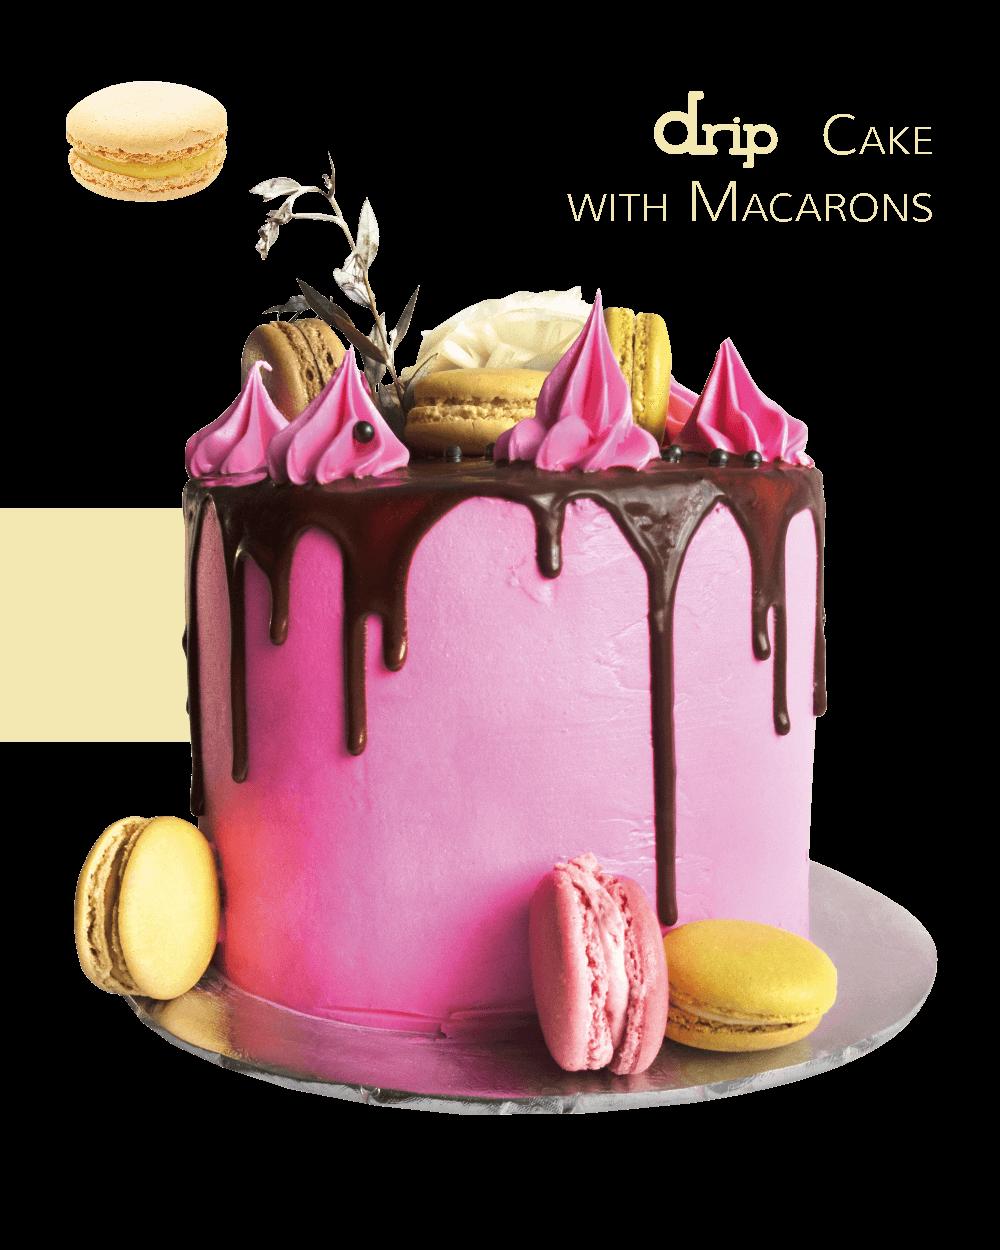 CAKE-DESIGN-DRIP-CAKE-WITH-MACARONS-responsive